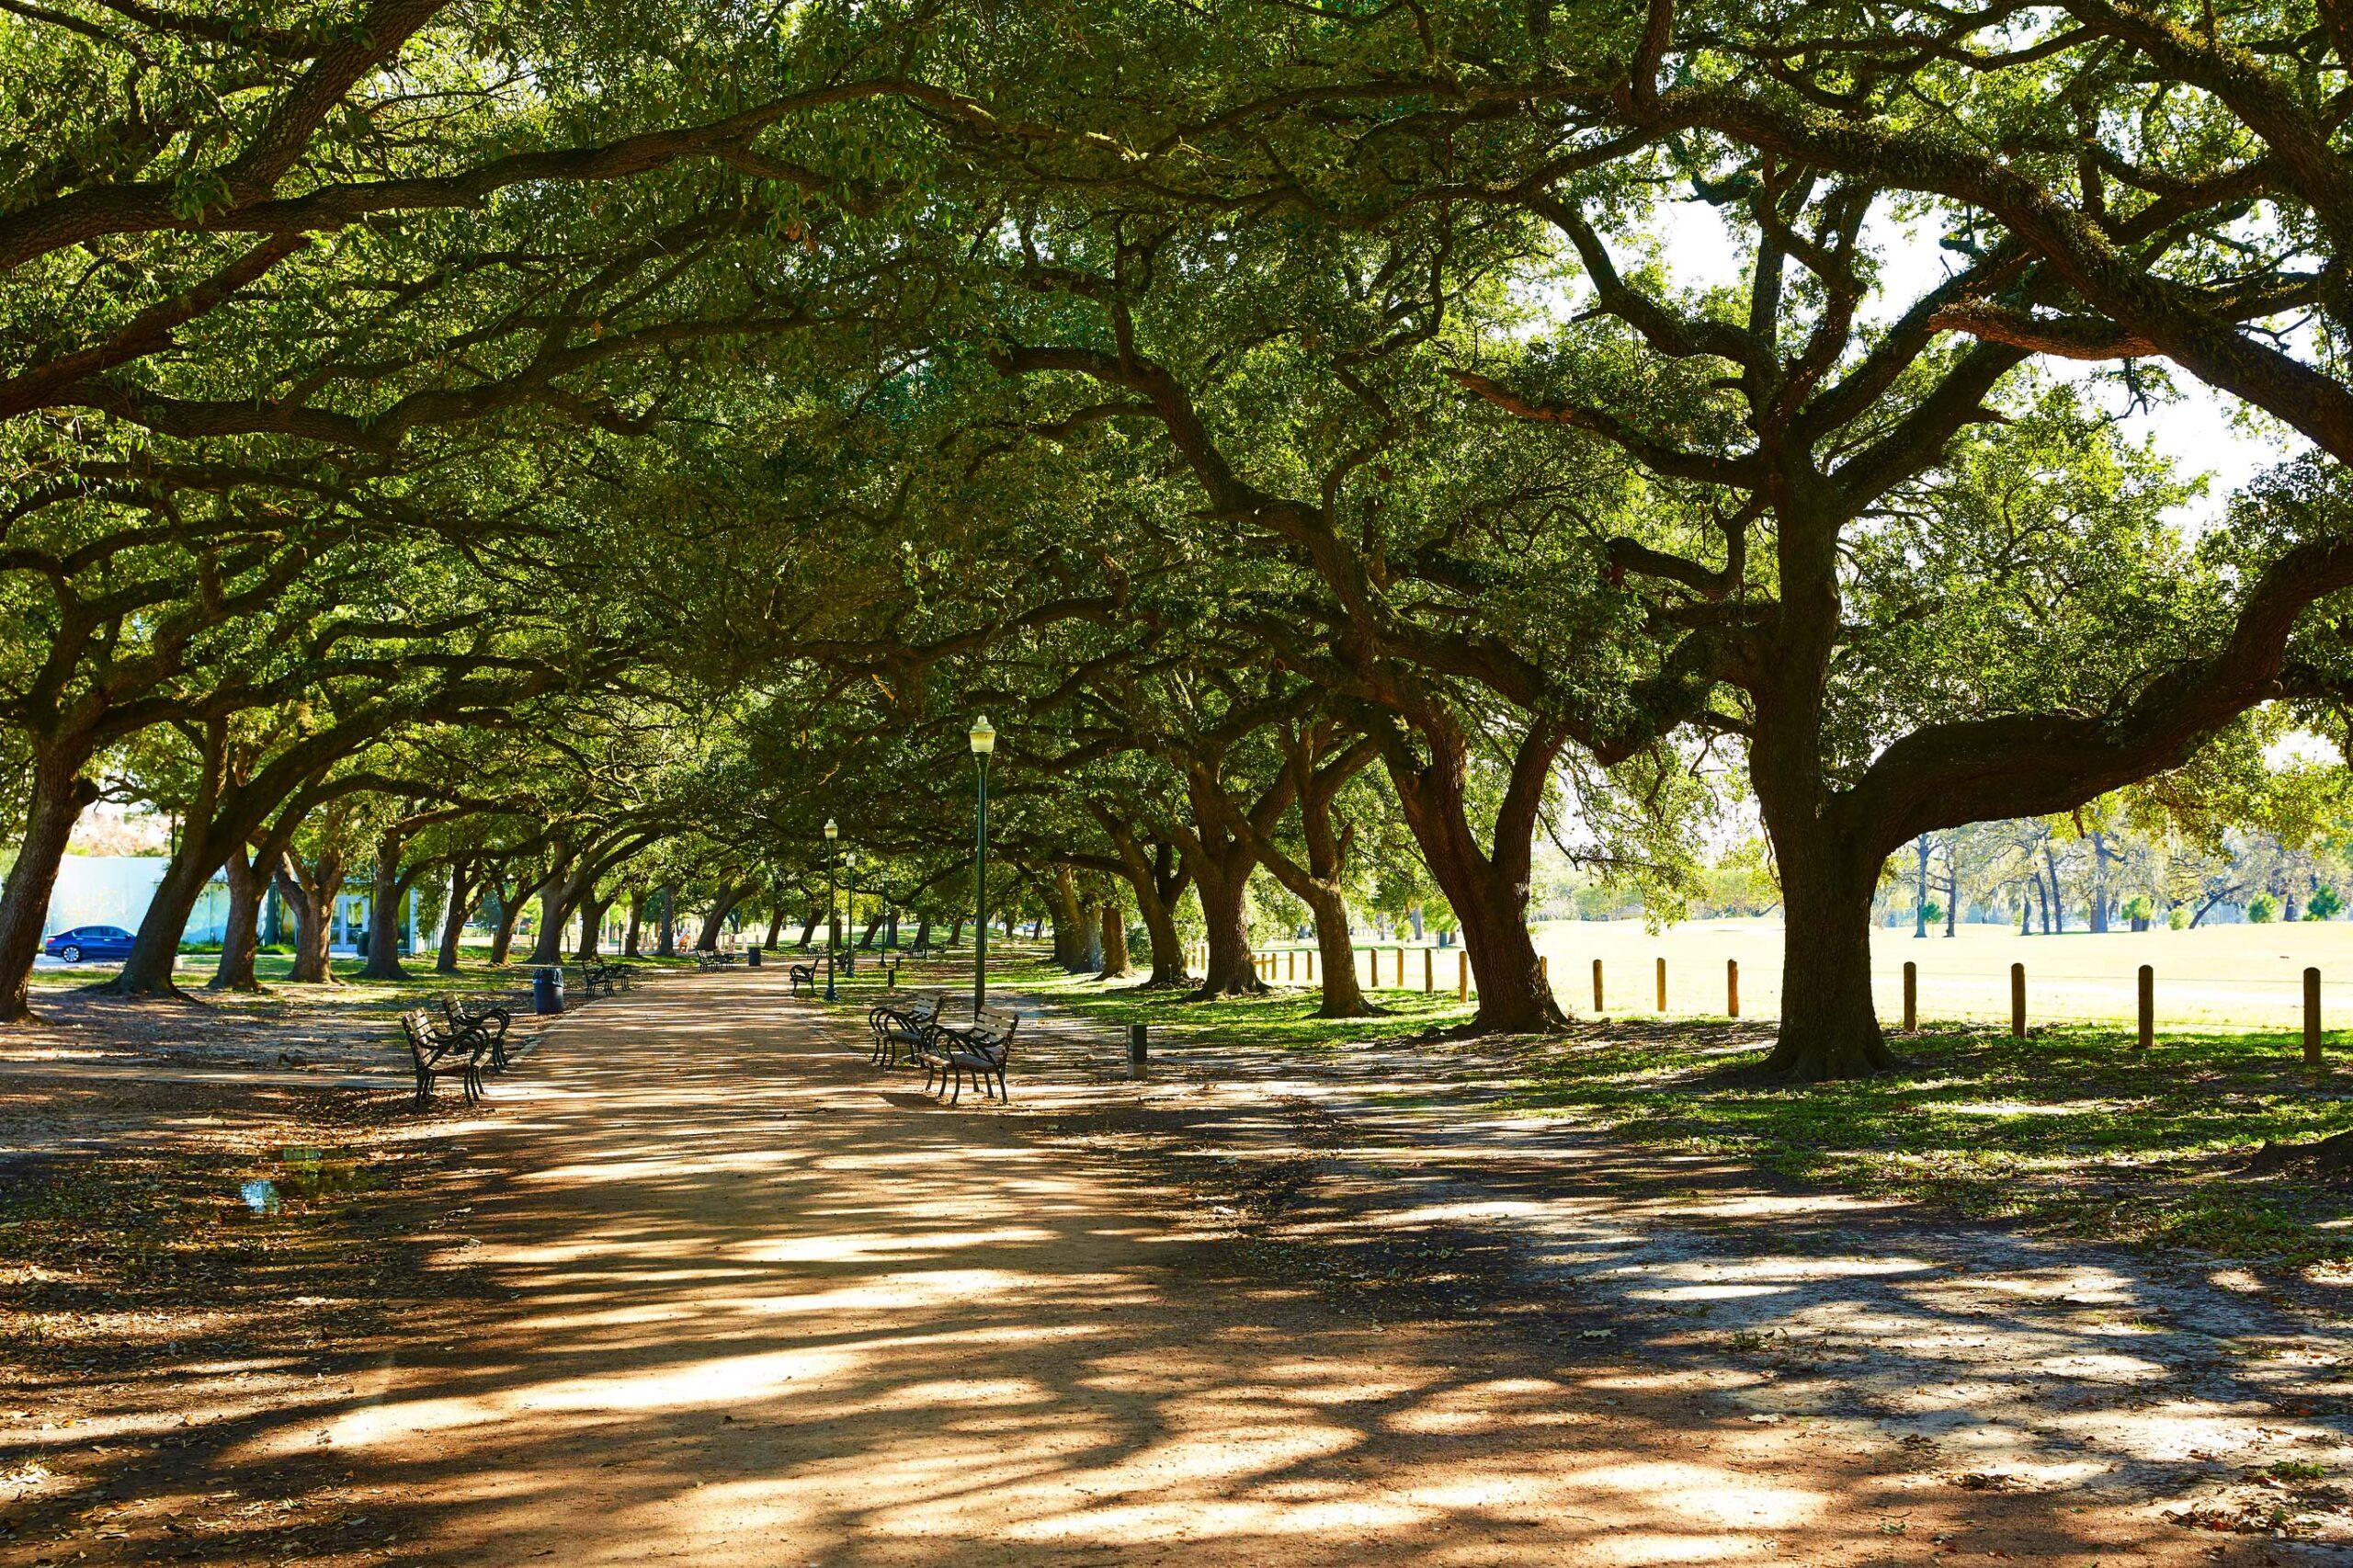 Shady avenue of oaks